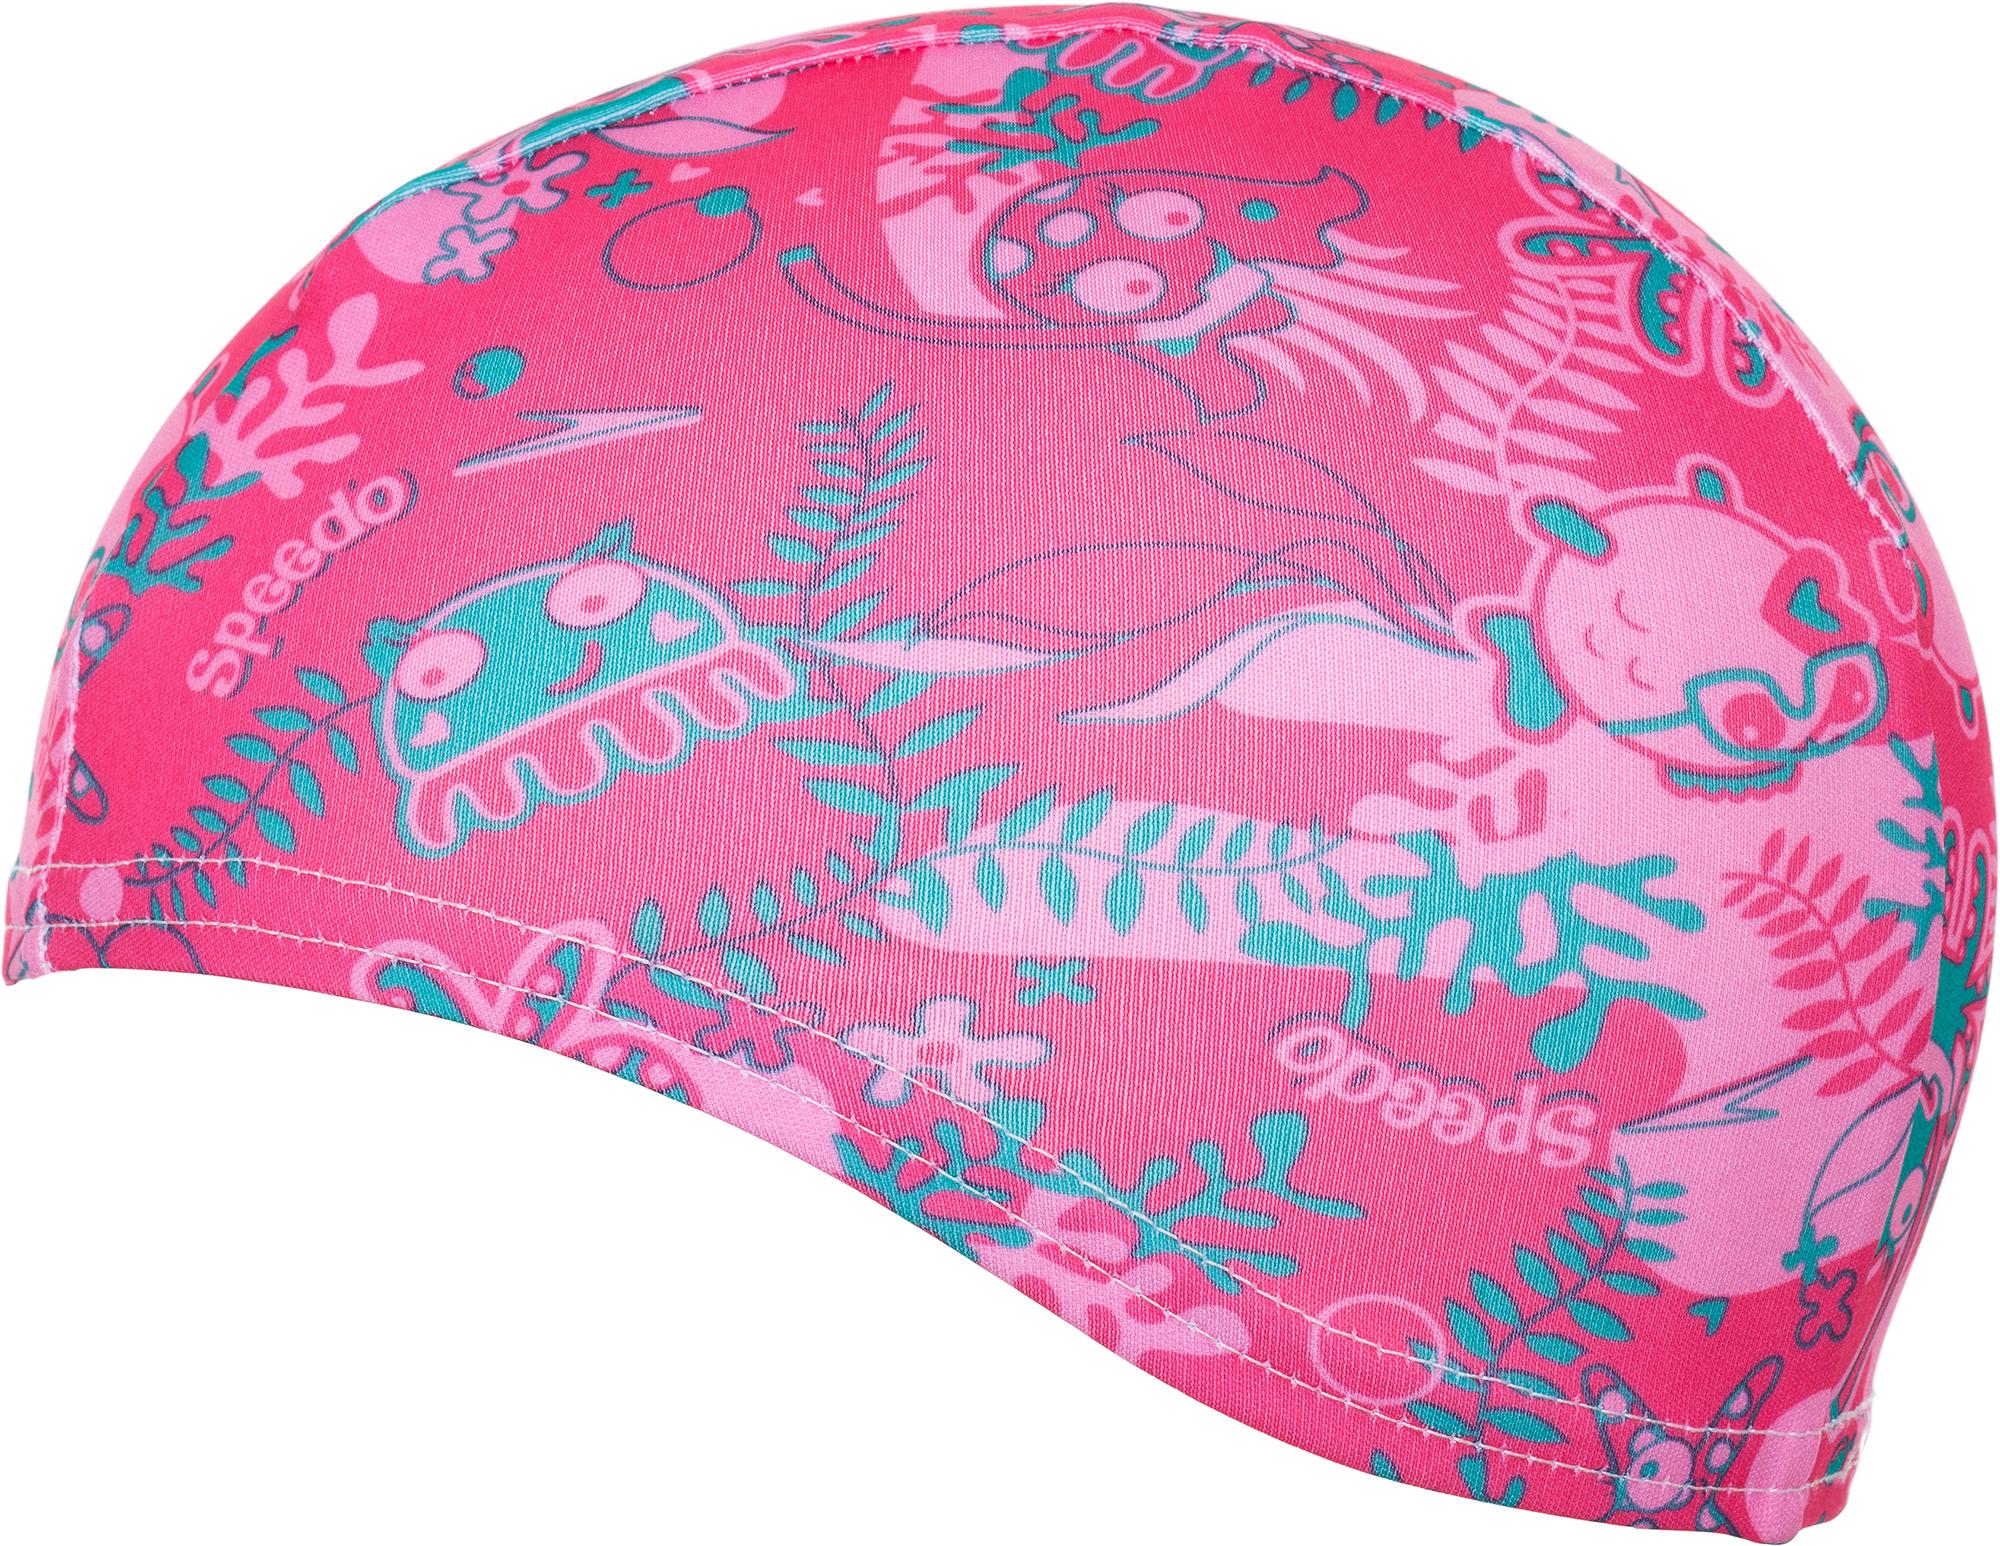 Speedo Шапочка для плавания детская Speedo Sea Squad, размер Без размера 3 01 8a 734